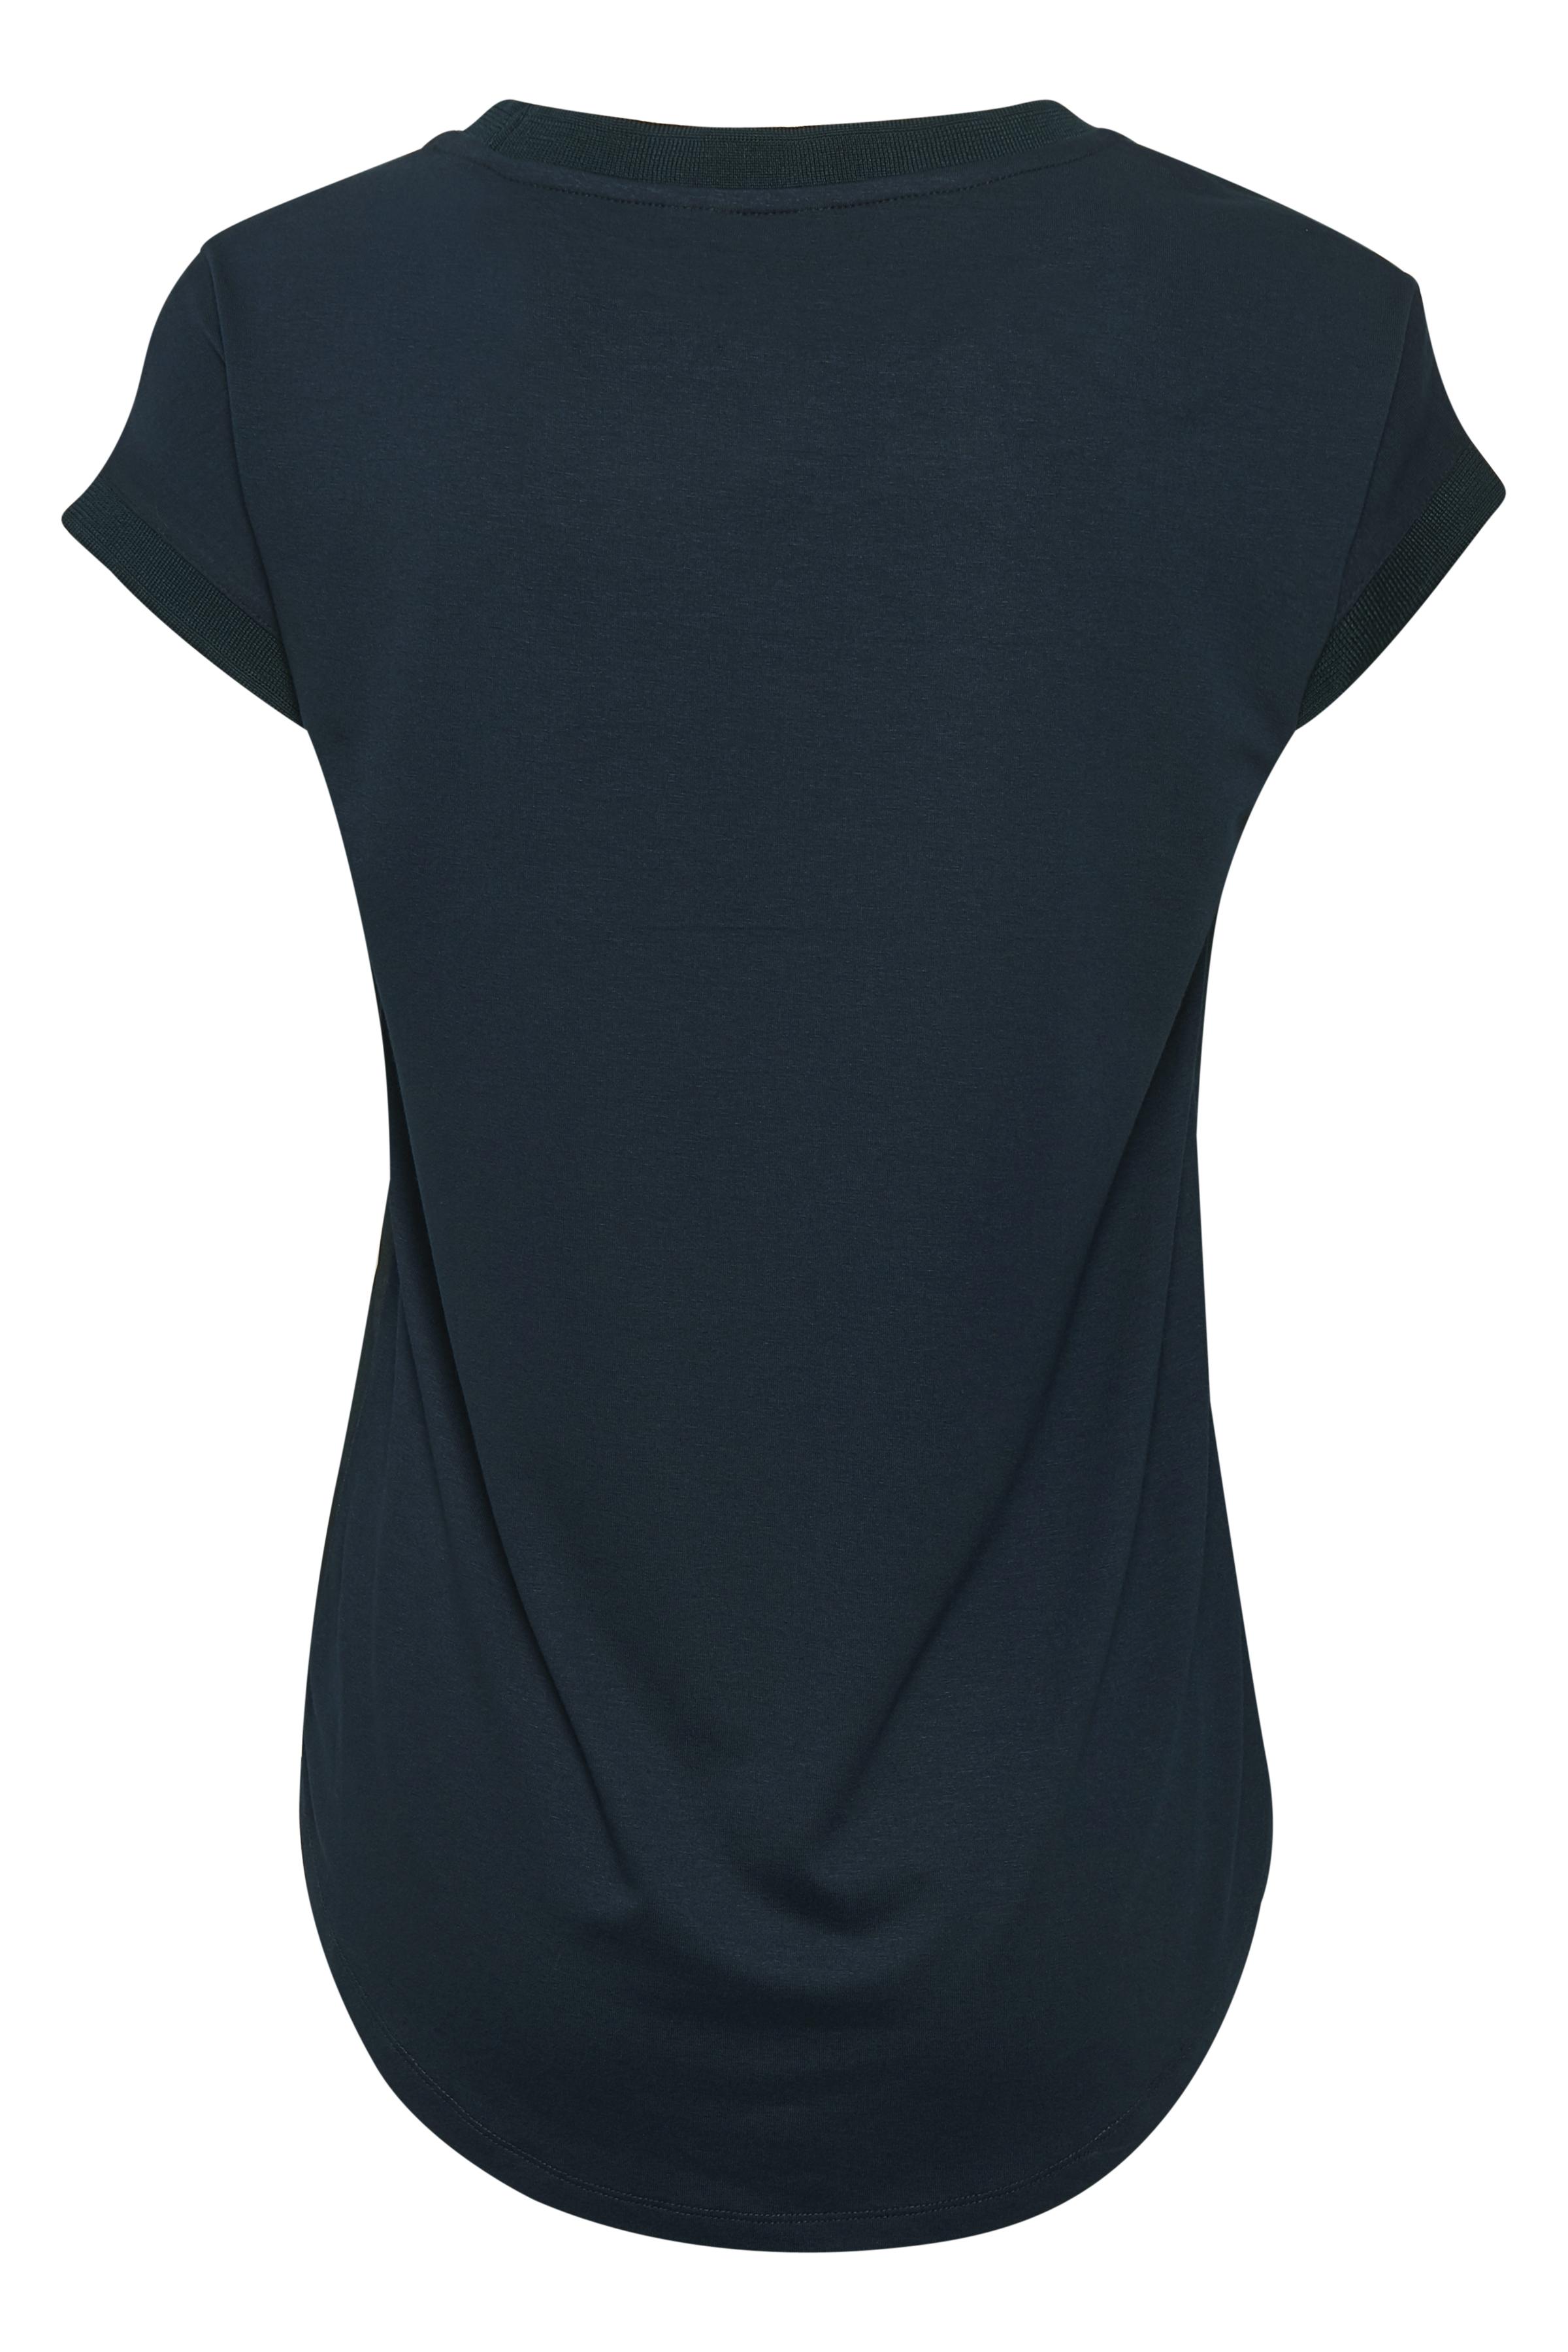 Marinblå Kortärmad blus från Bon'A Parte – Köp Marinblå Kortärmad blus från stl. S-2XL här